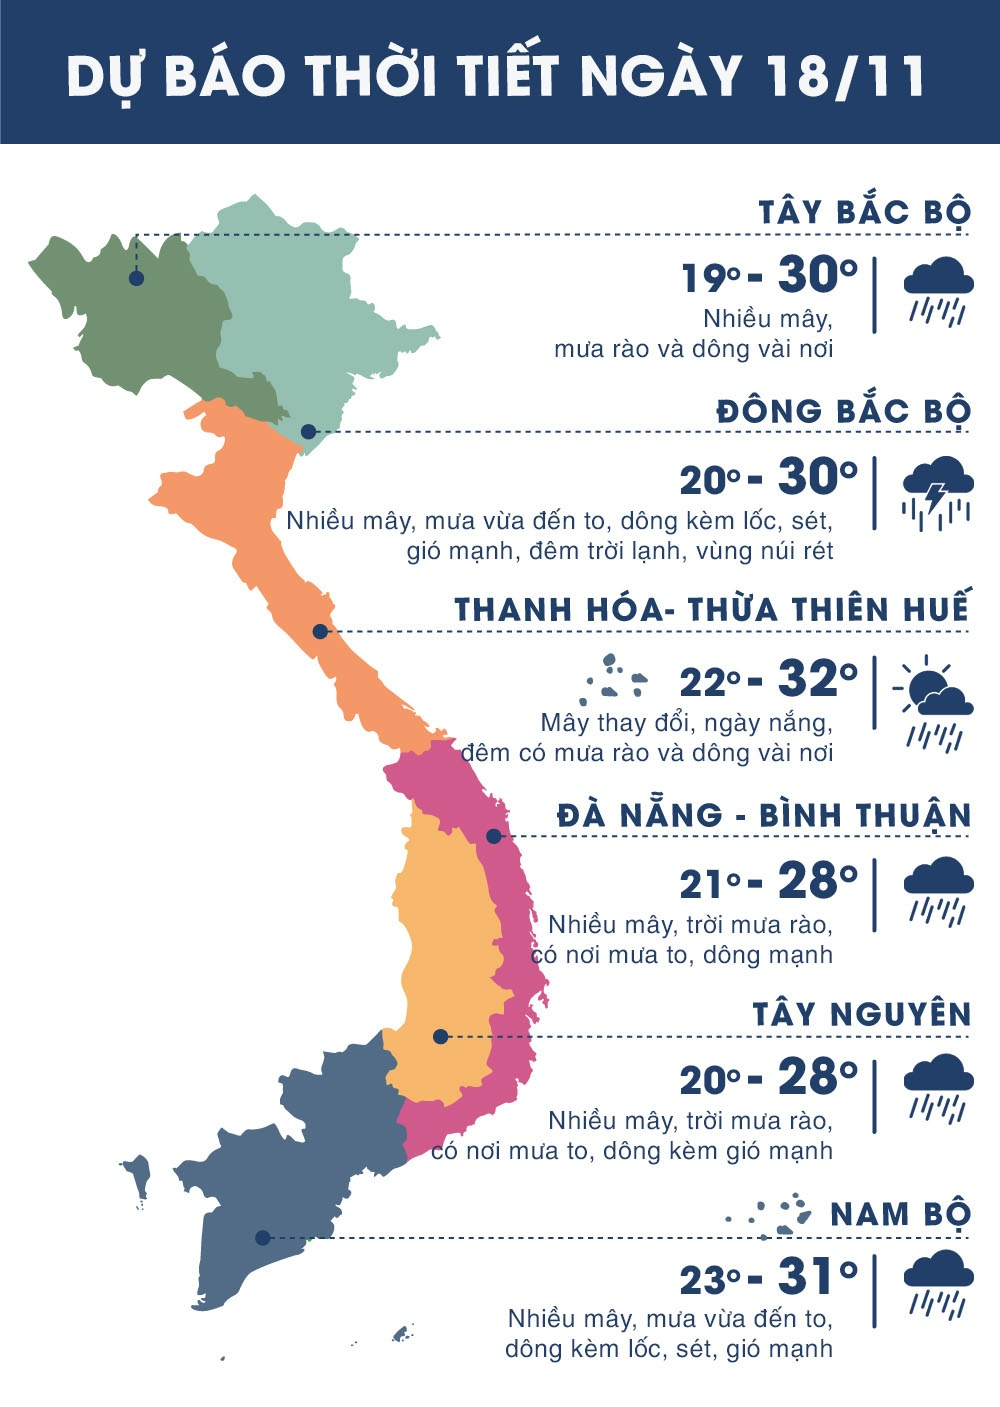 Thoi tiet ngay 18/11: Nam Bo mua lon, dong manh vi bao so 8 hinh anh 1